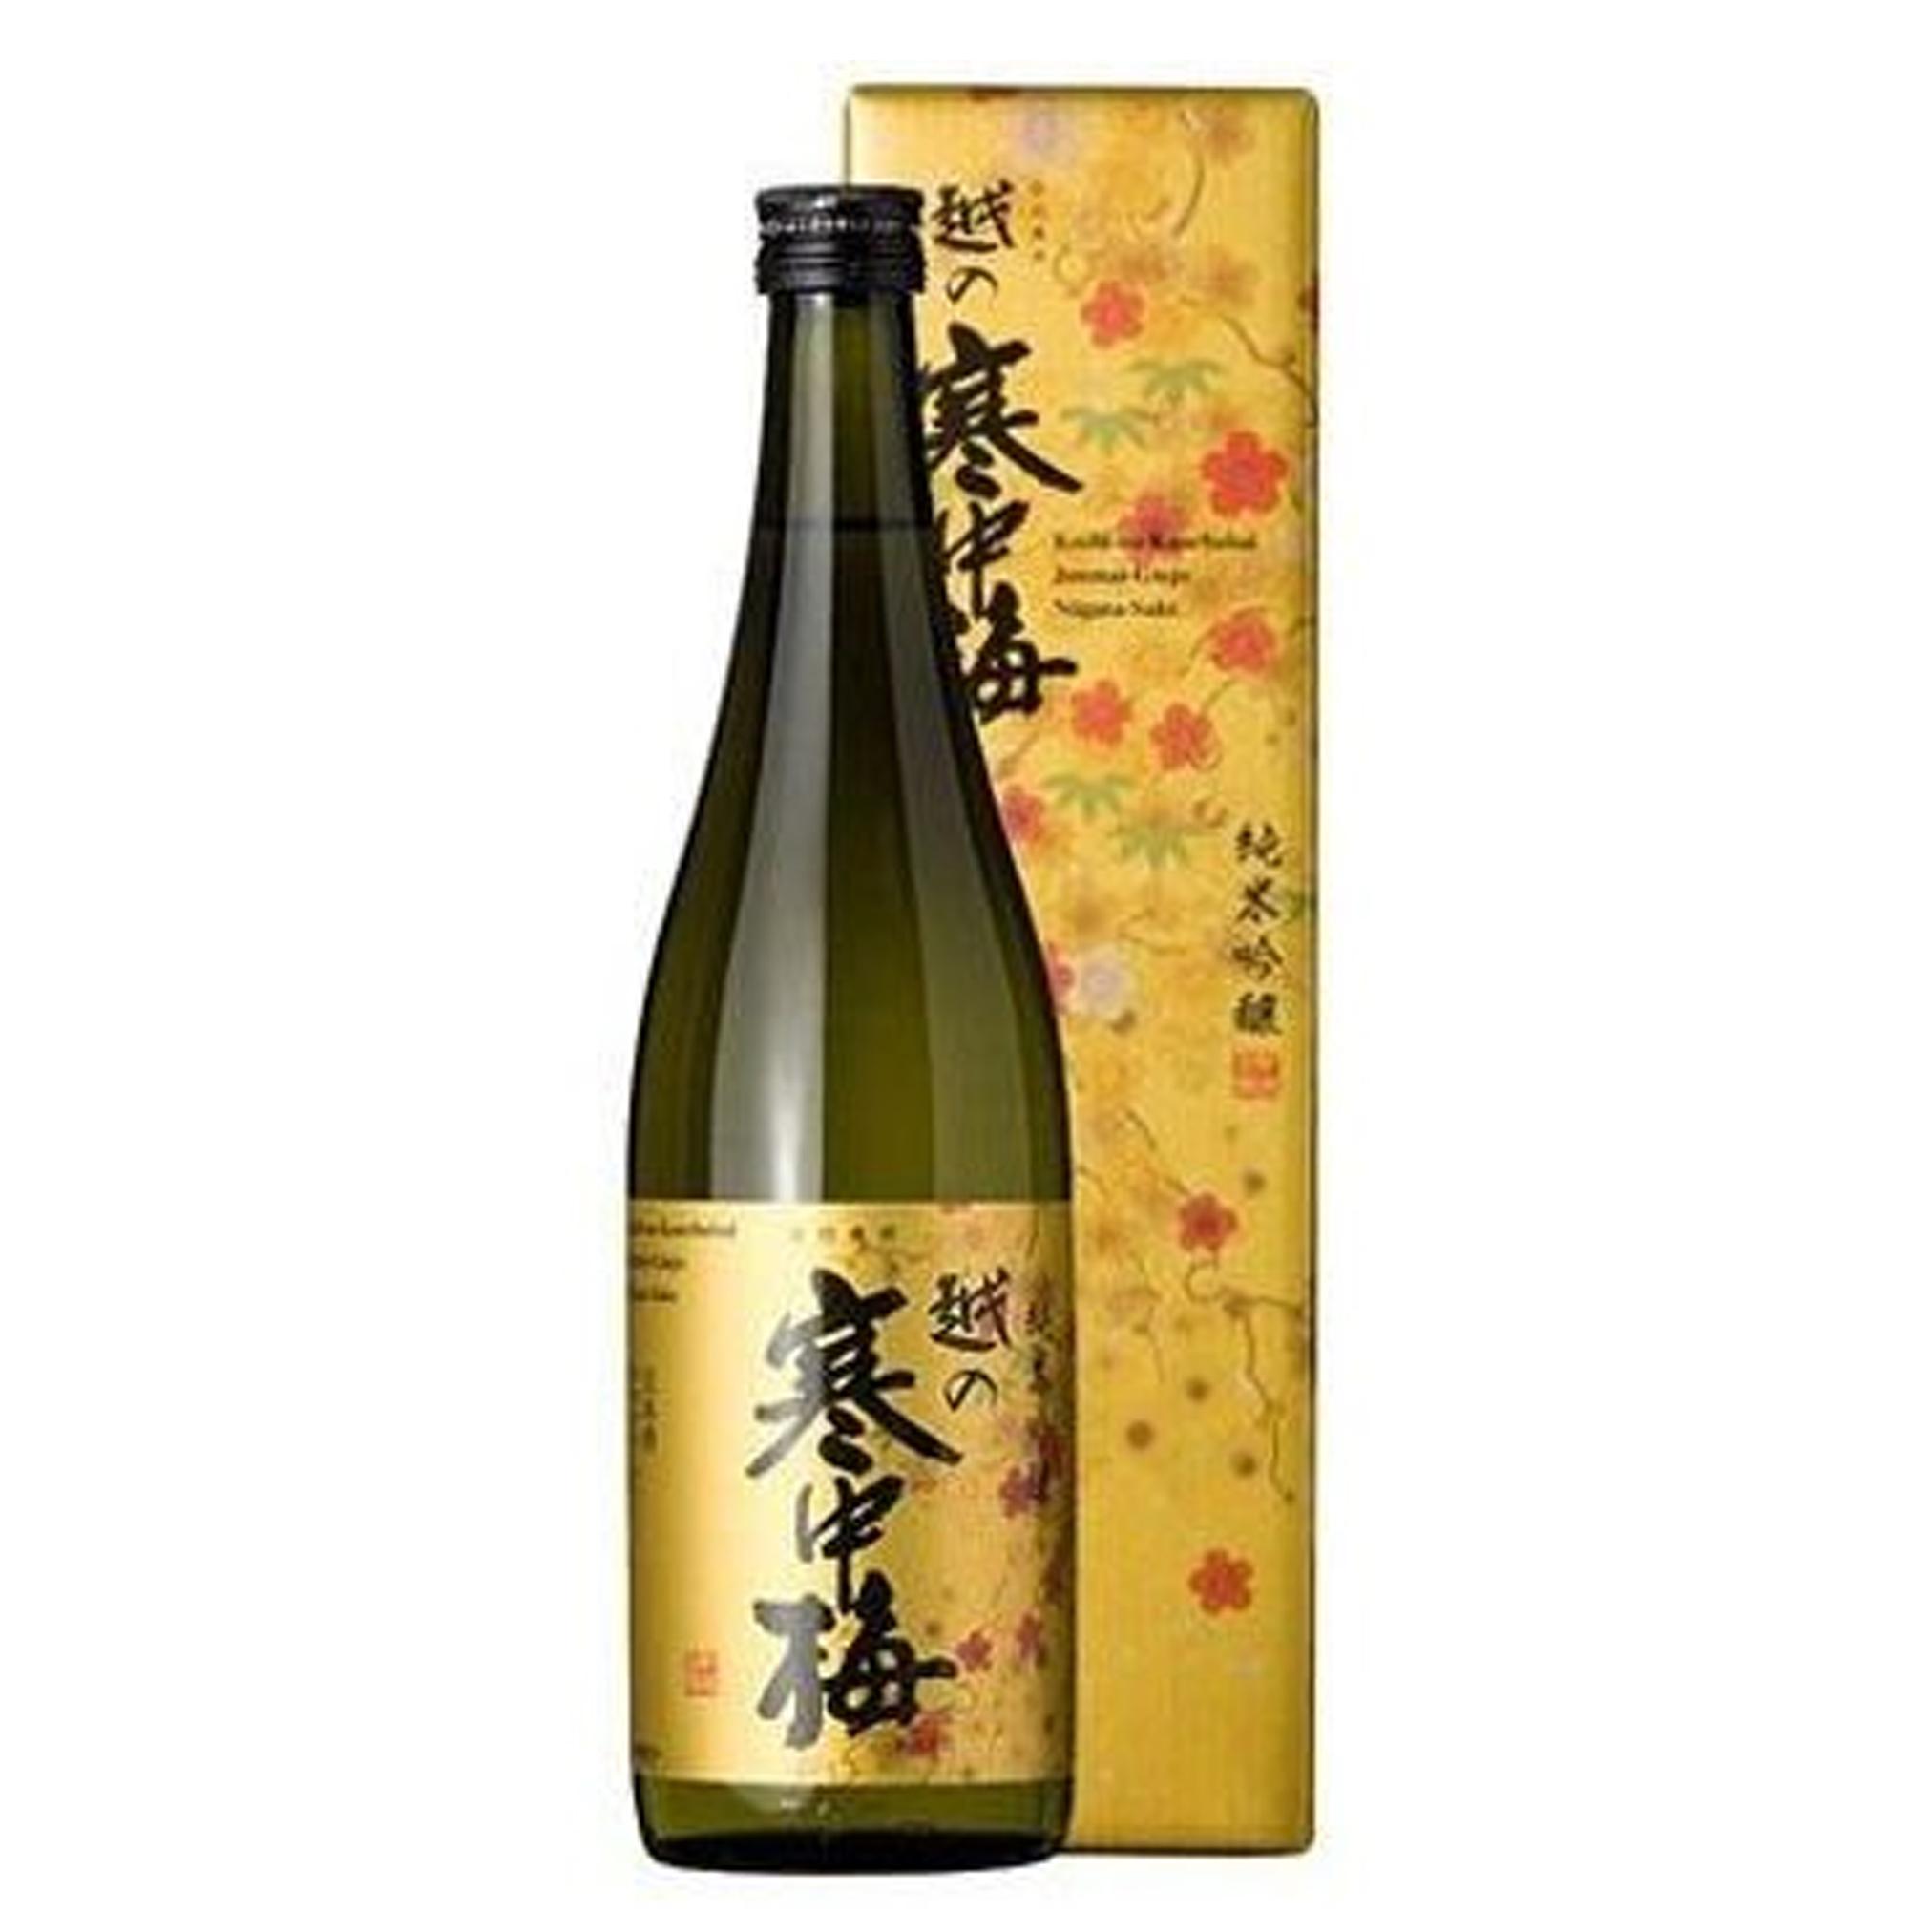 Koshinokanchubai Kin Label Junmai Ginjo 14% 720ml